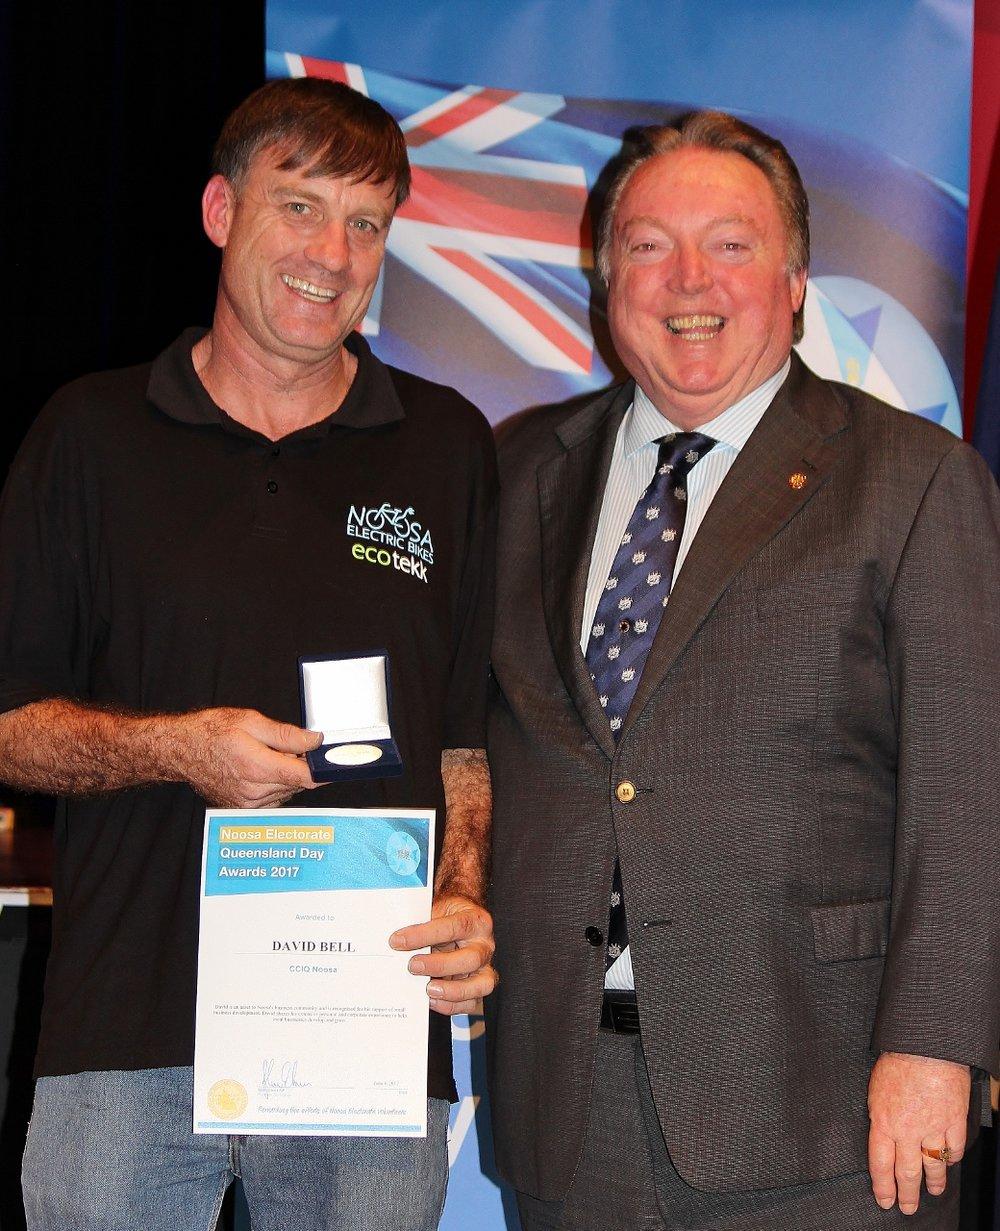 A friend representing David Bell with Glen Elmes (1).jpg